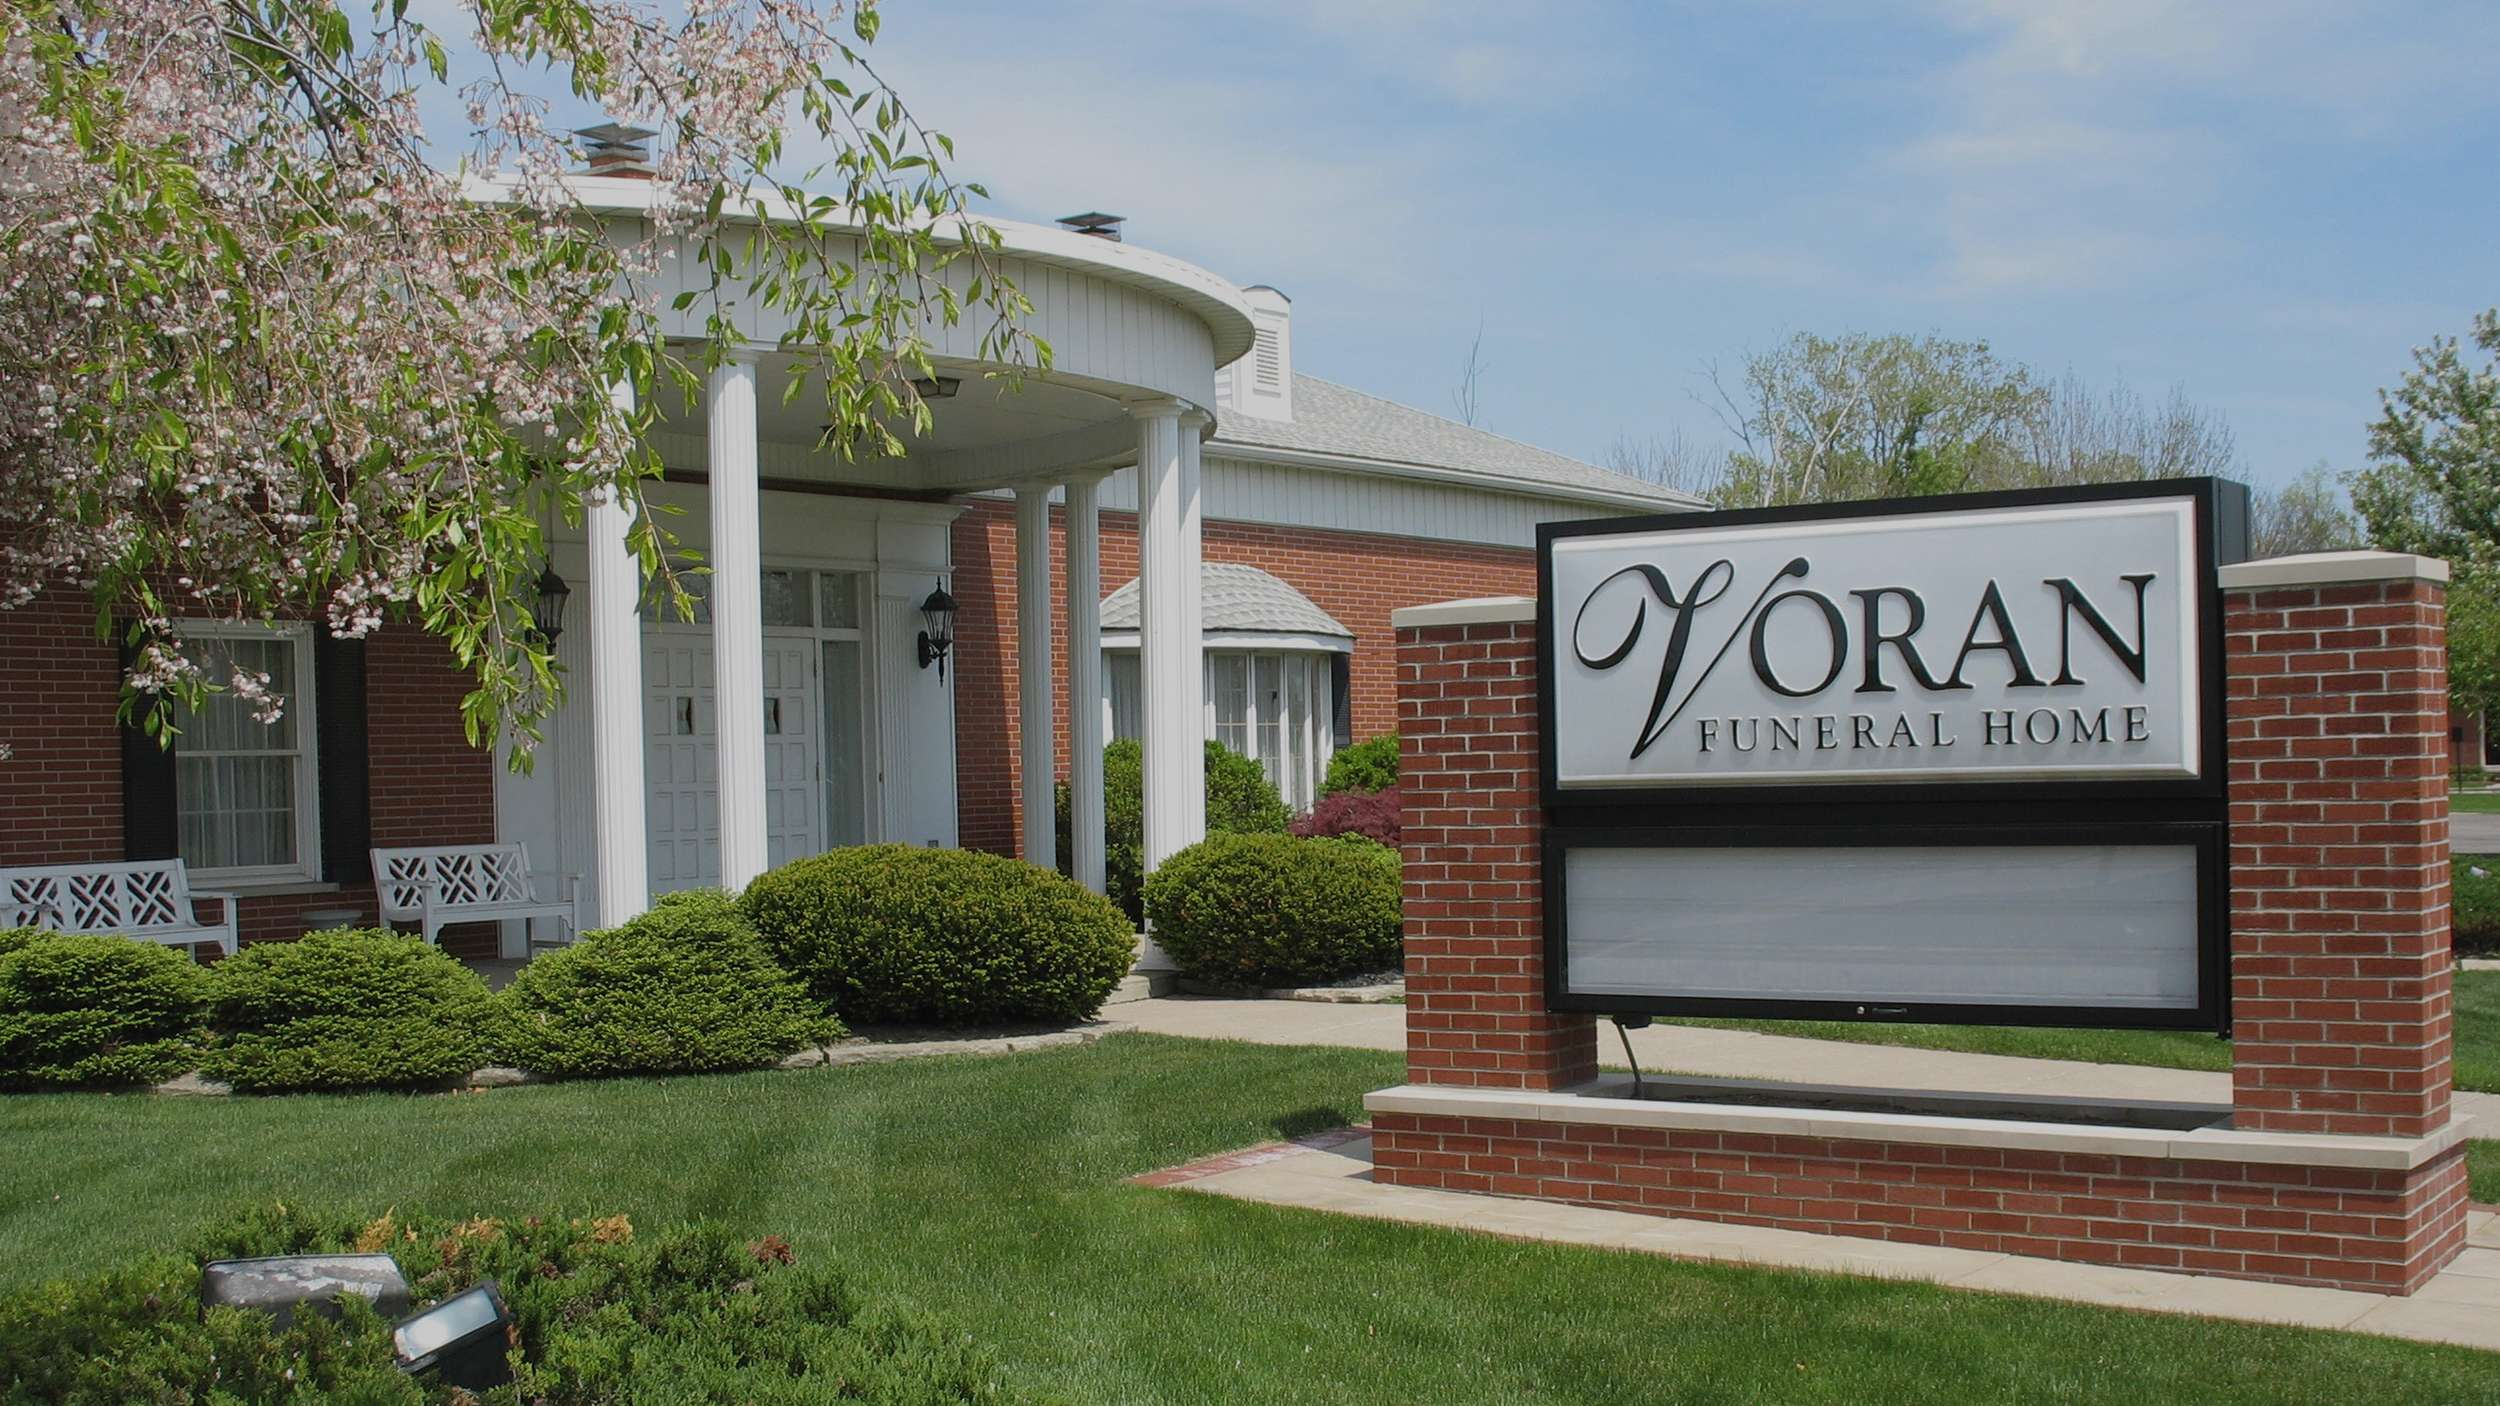 Allen Park, Dearborn & Taylor, MI Funeral Home & Cremation